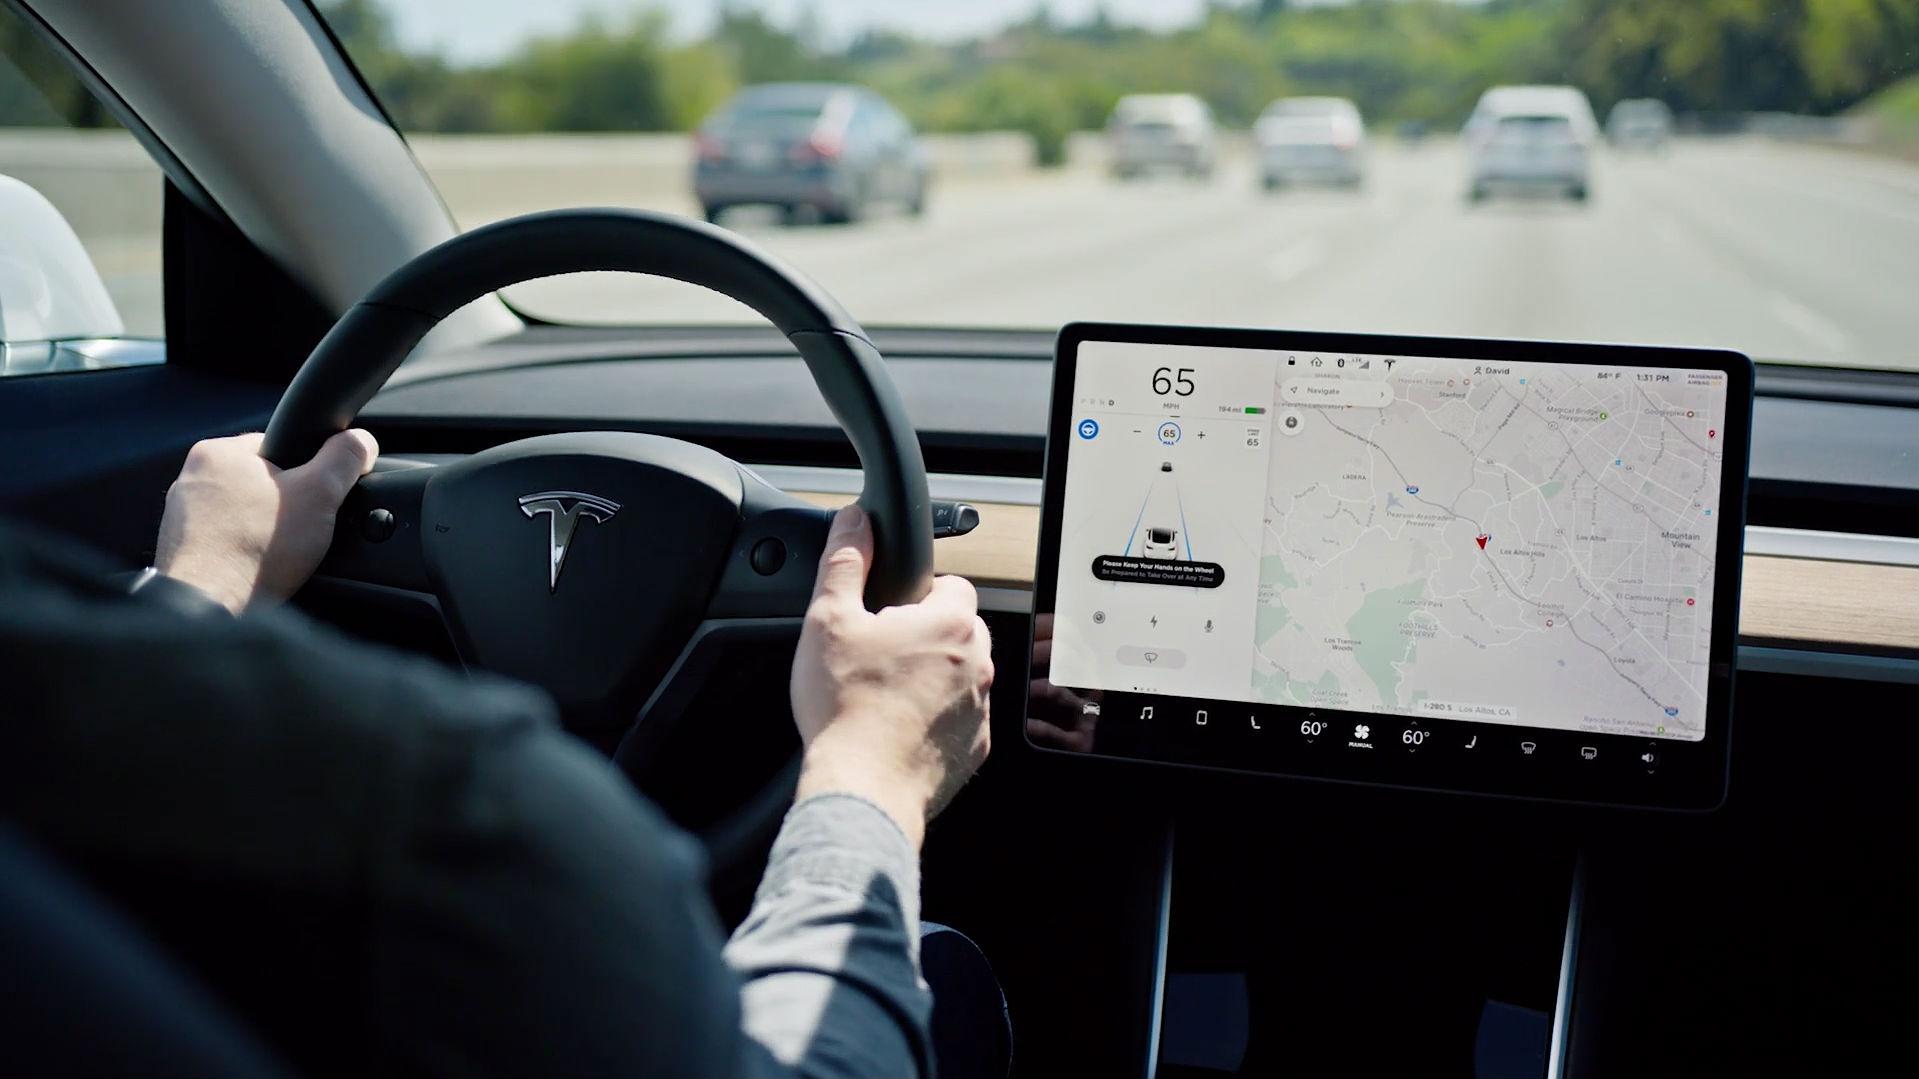 Tesla Autopilot теперь занимает второе место в GM Super Cruise: Consumer Reports